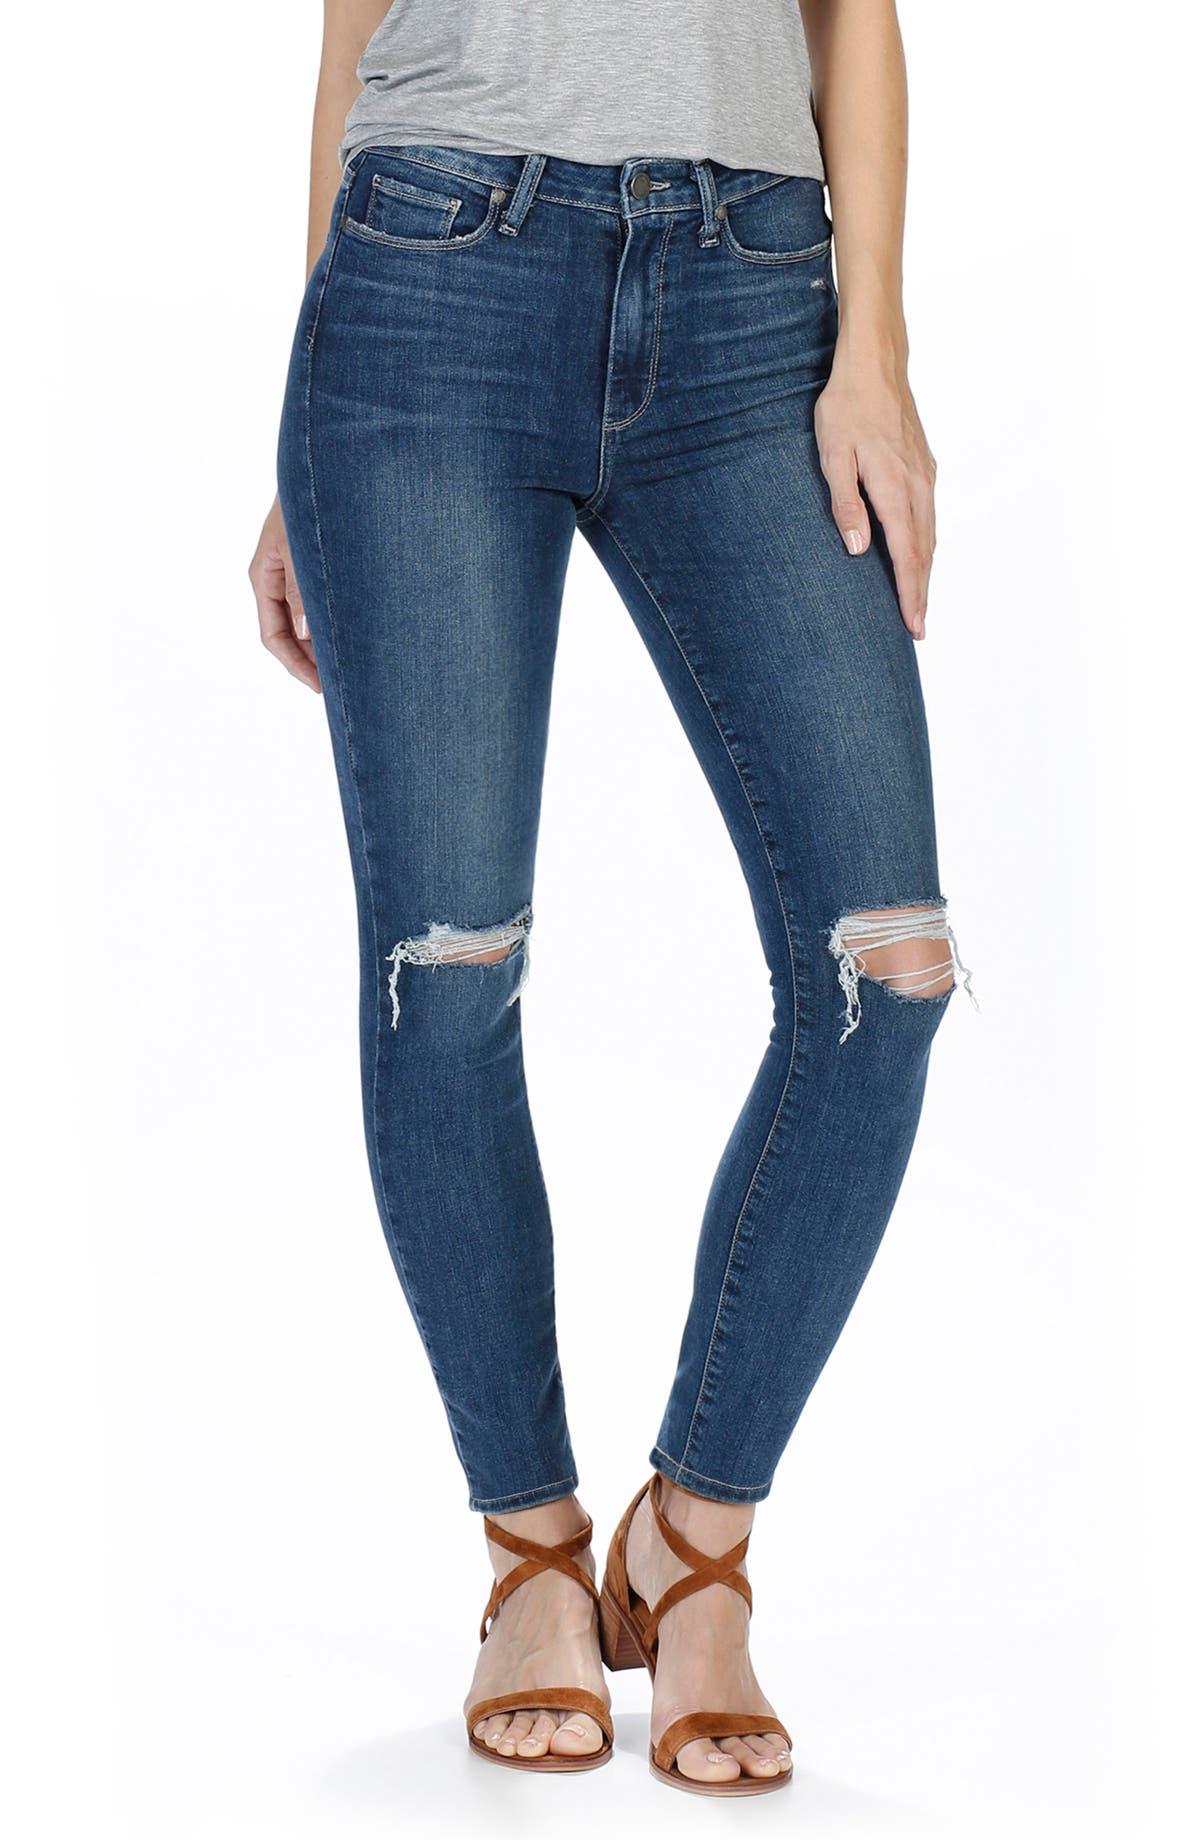 0fea4f07cd PAIGE Margot High Waist Ultra Skinny Jeans (Dedee Destructed)   Nordstrom